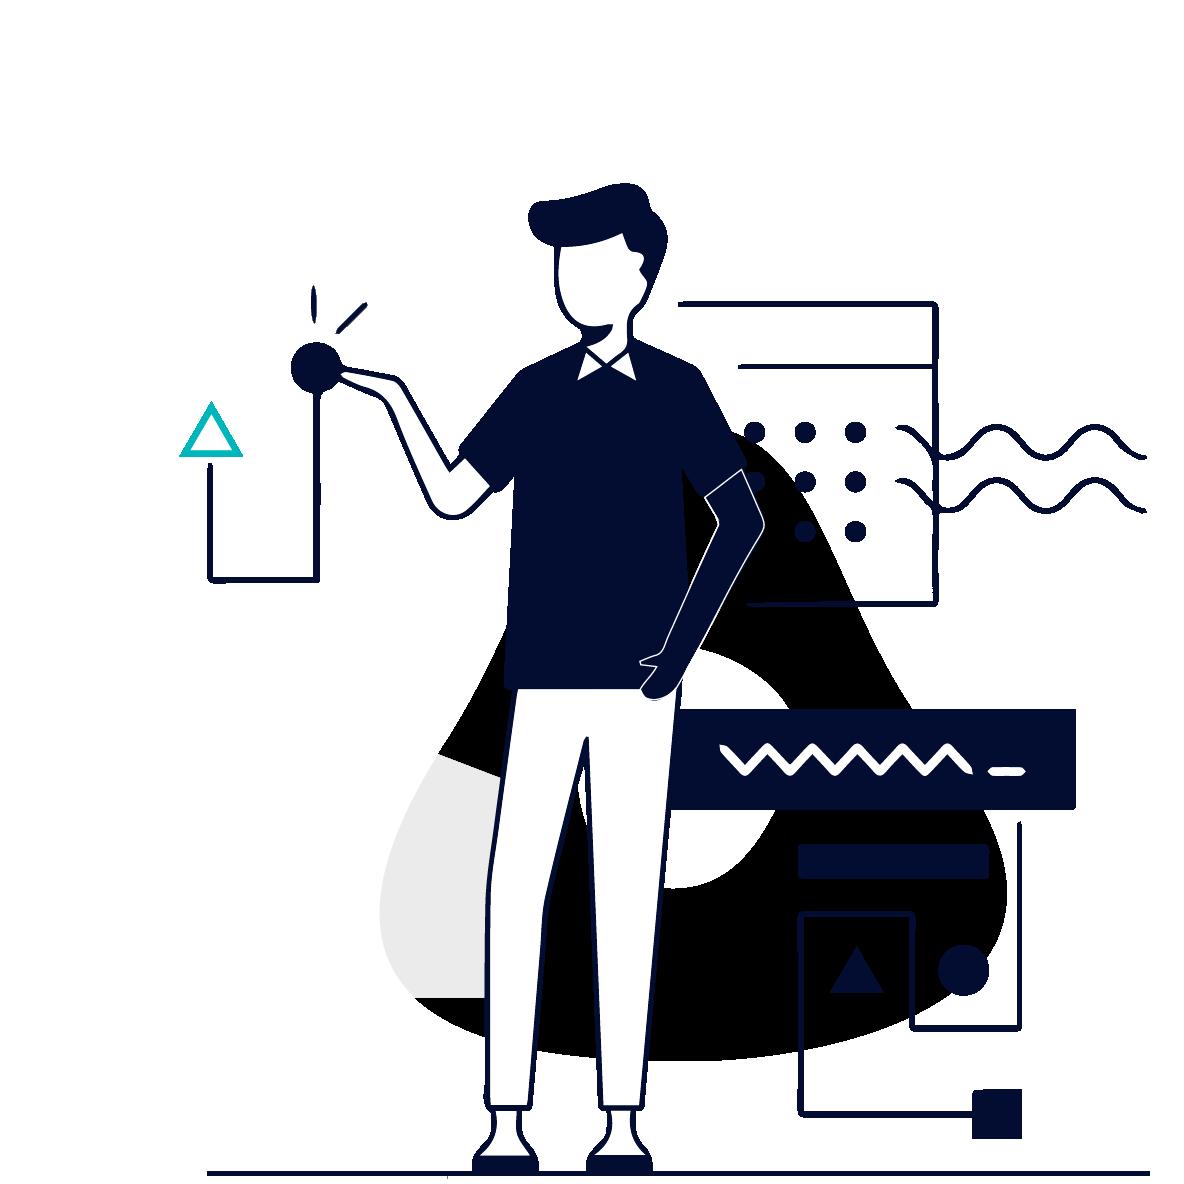 Illustration für prostep ivip Symposium